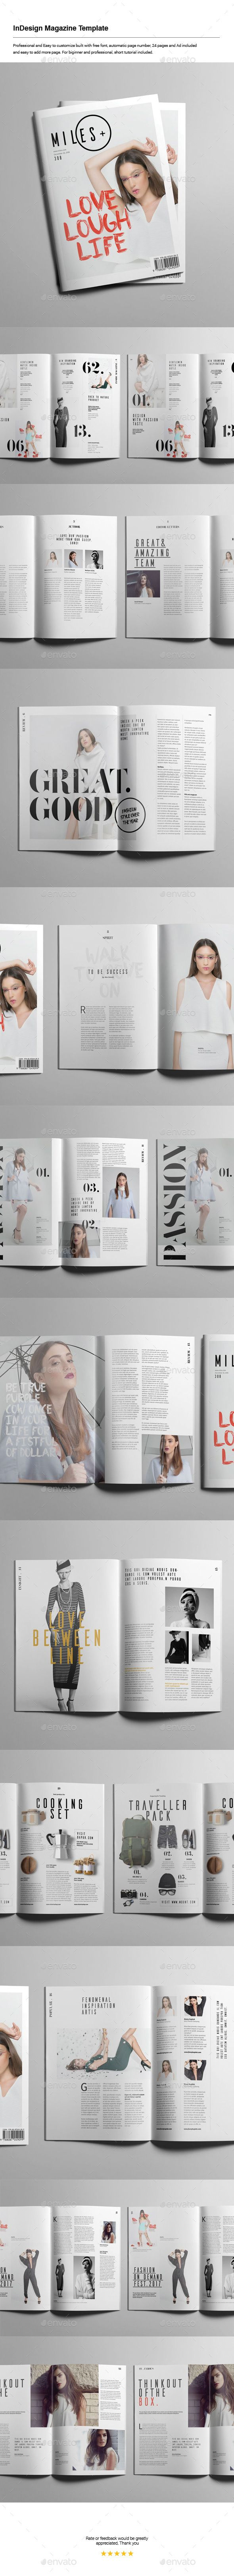 Magazine Template InDesign INDD #design Download: http://graphicriver.net/item/indesign-magazine-template/14312651?ref=ksioks